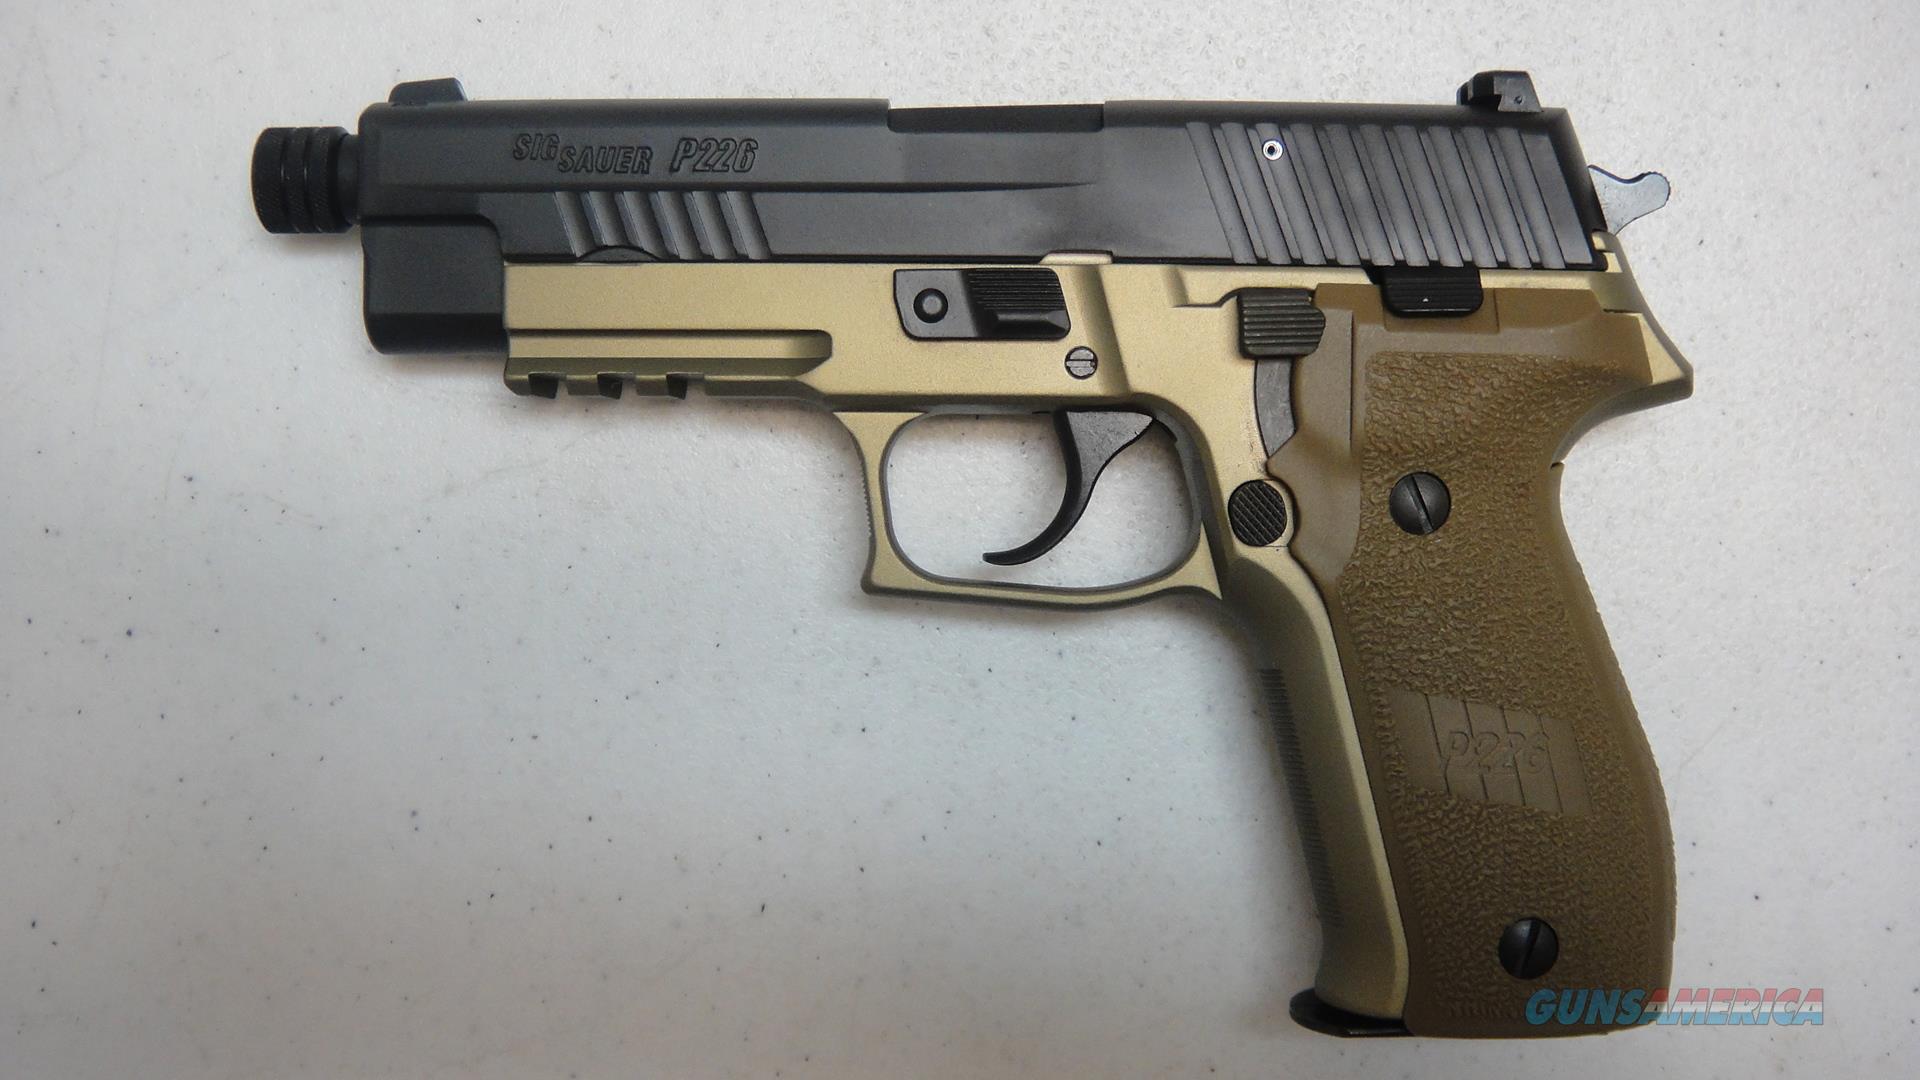 Sig Sauer P226 Combat w/ nights sights  Guns > Pistols > Sig - Sauer/Sigarms Pistols > P226